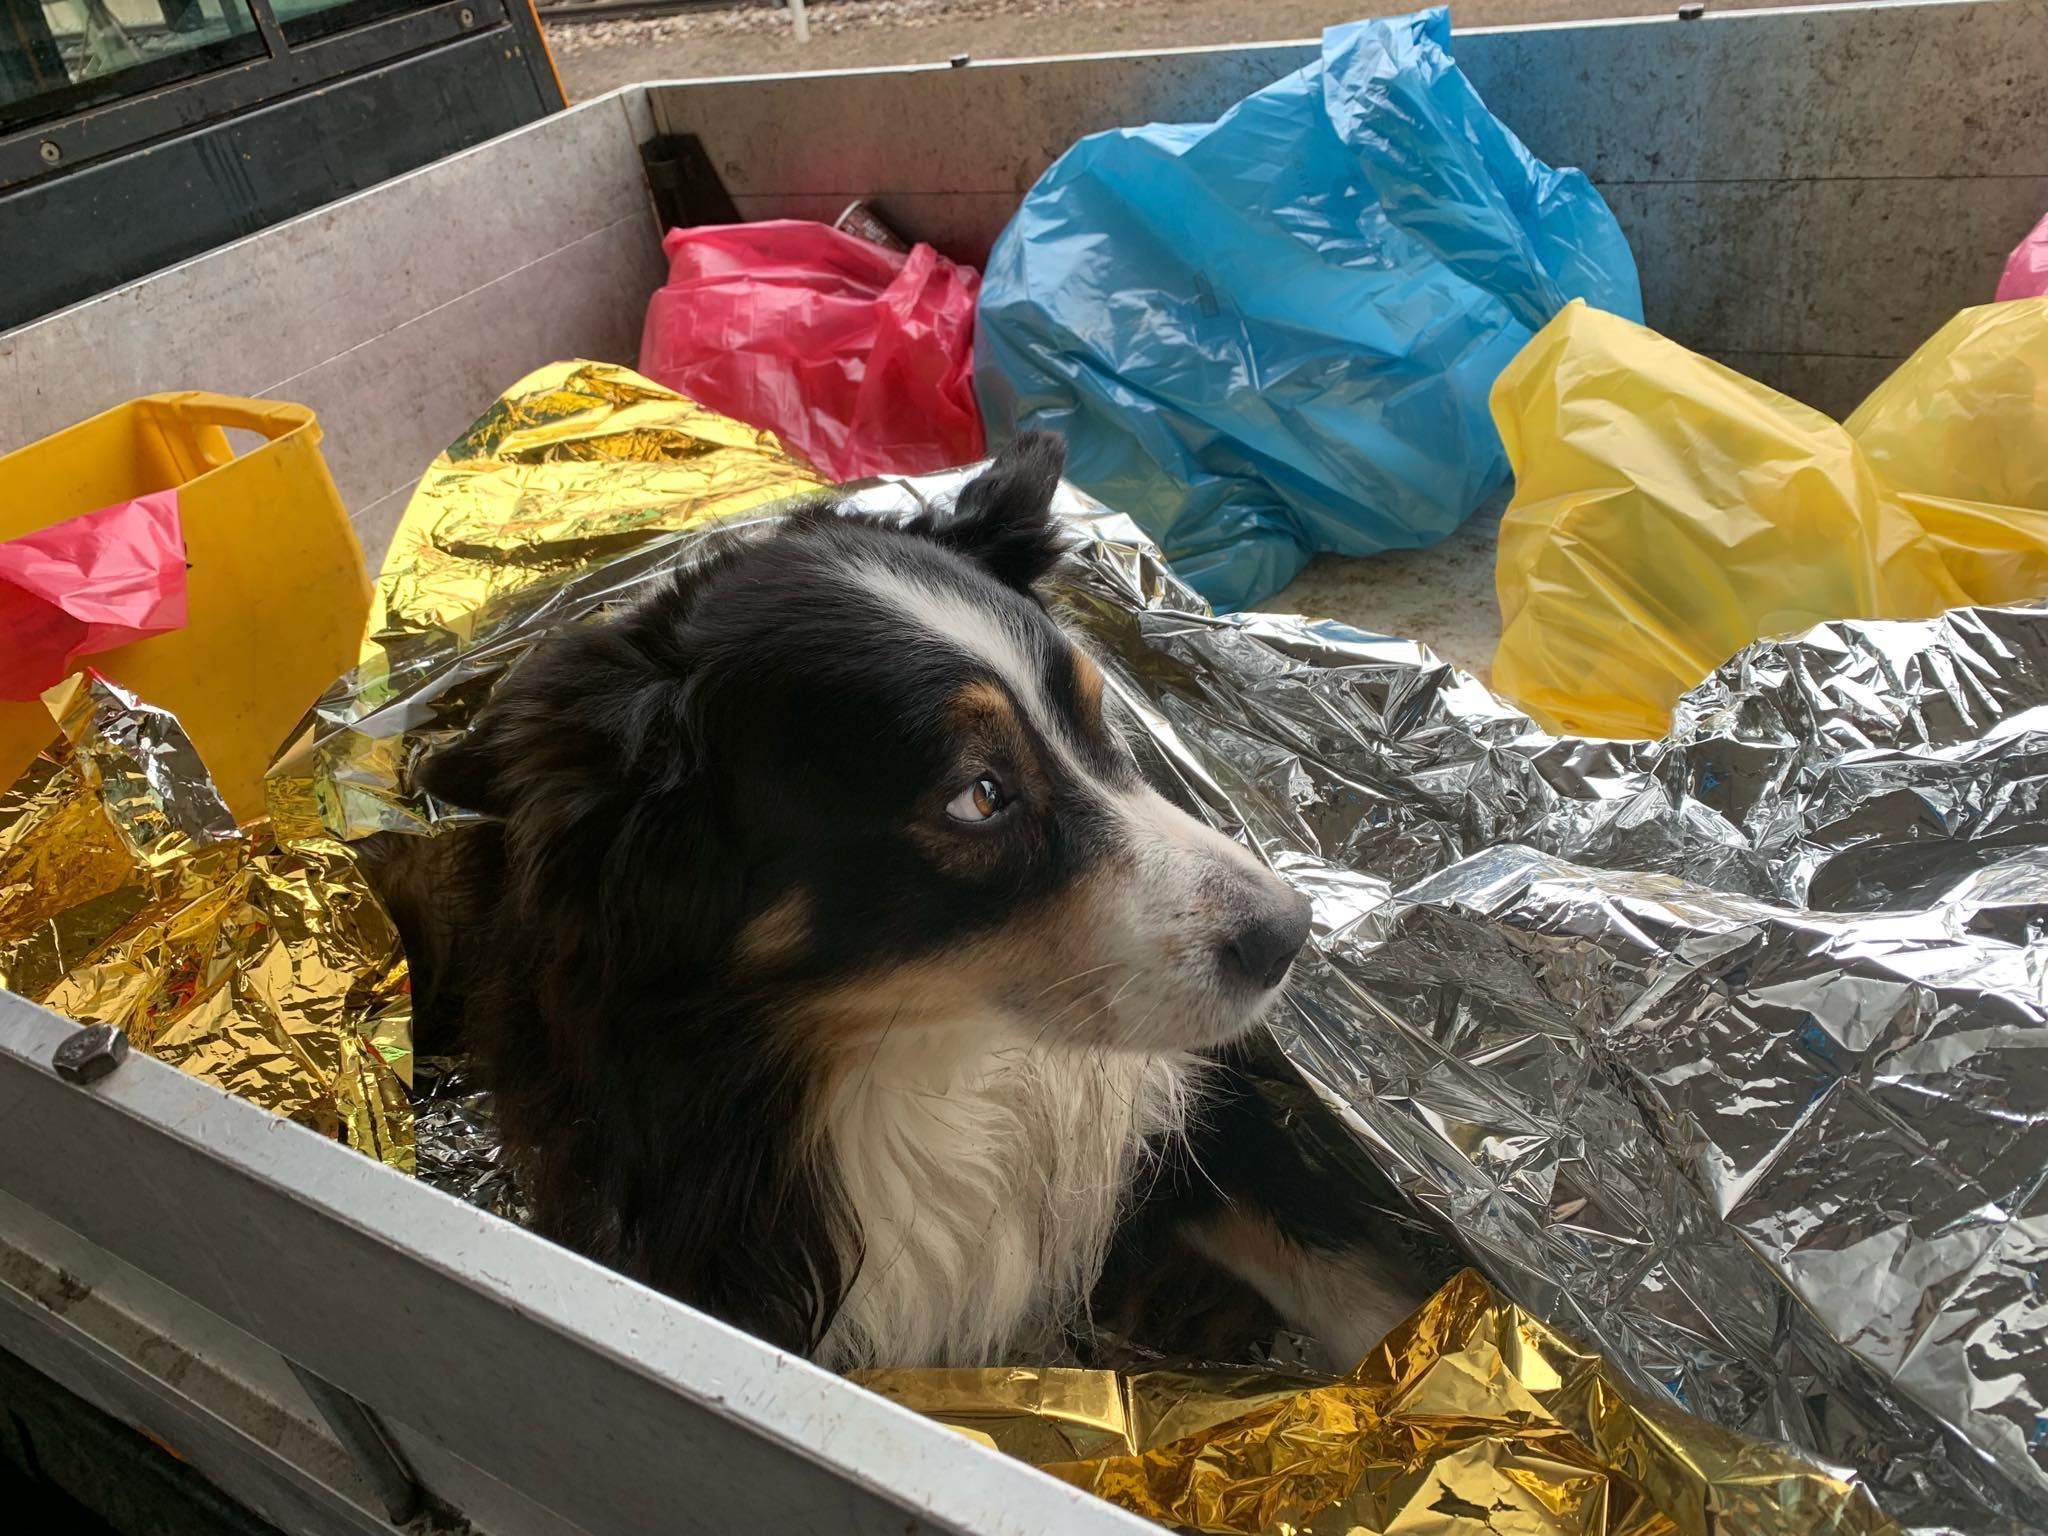 Hund_TierrettungRN.jpg